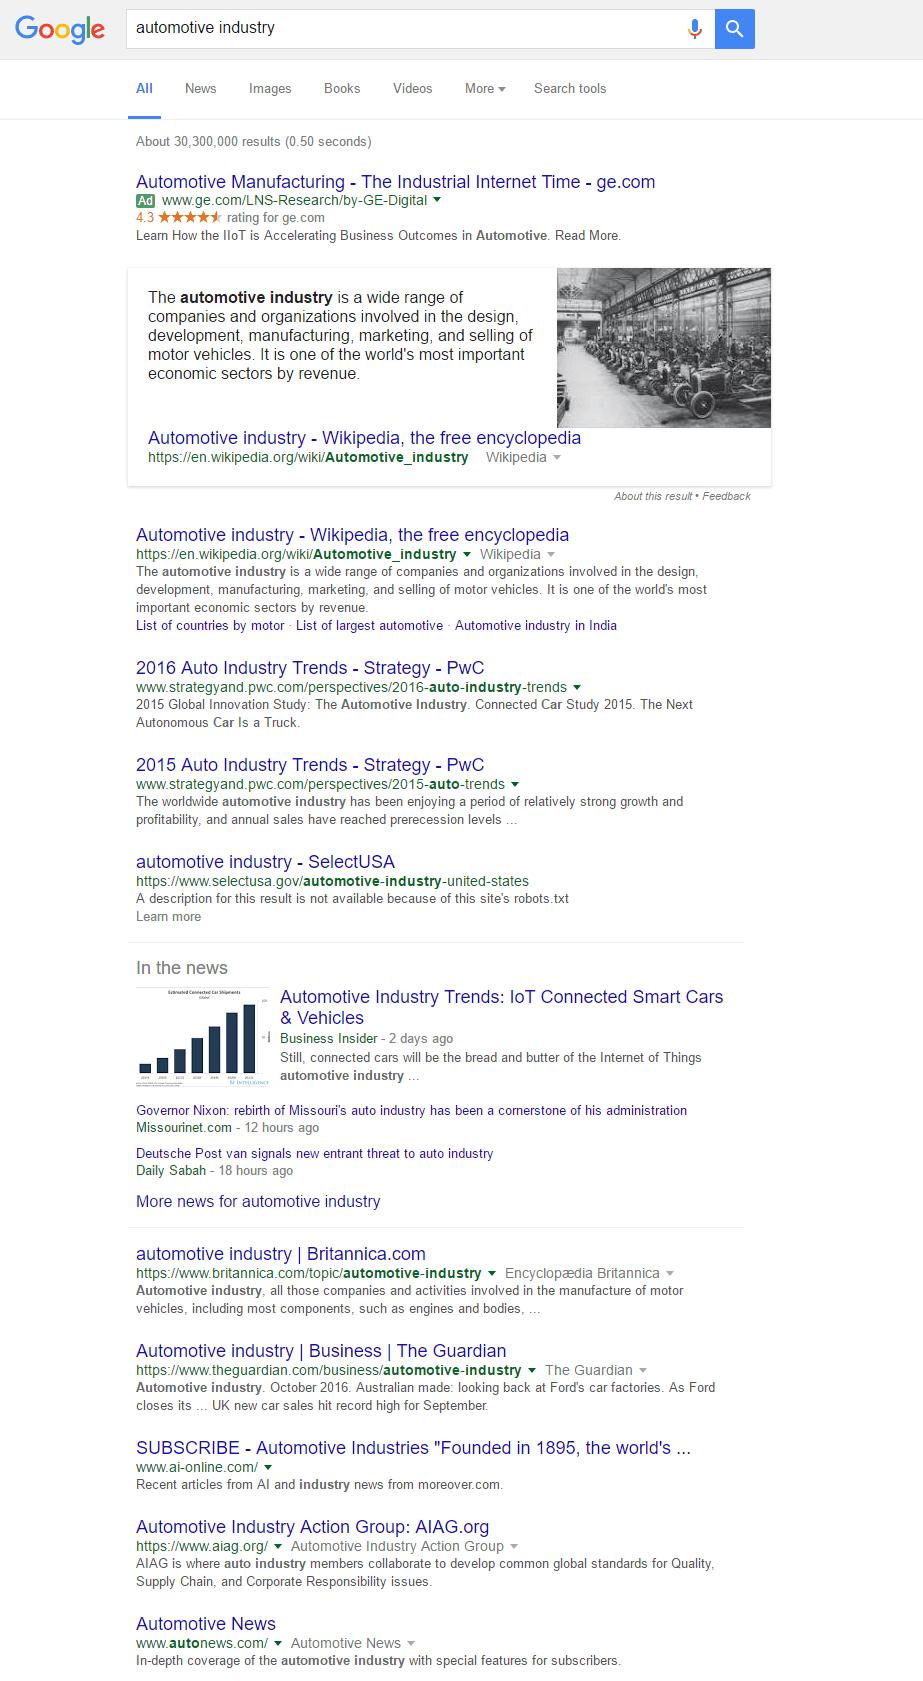 automotive industry SERP